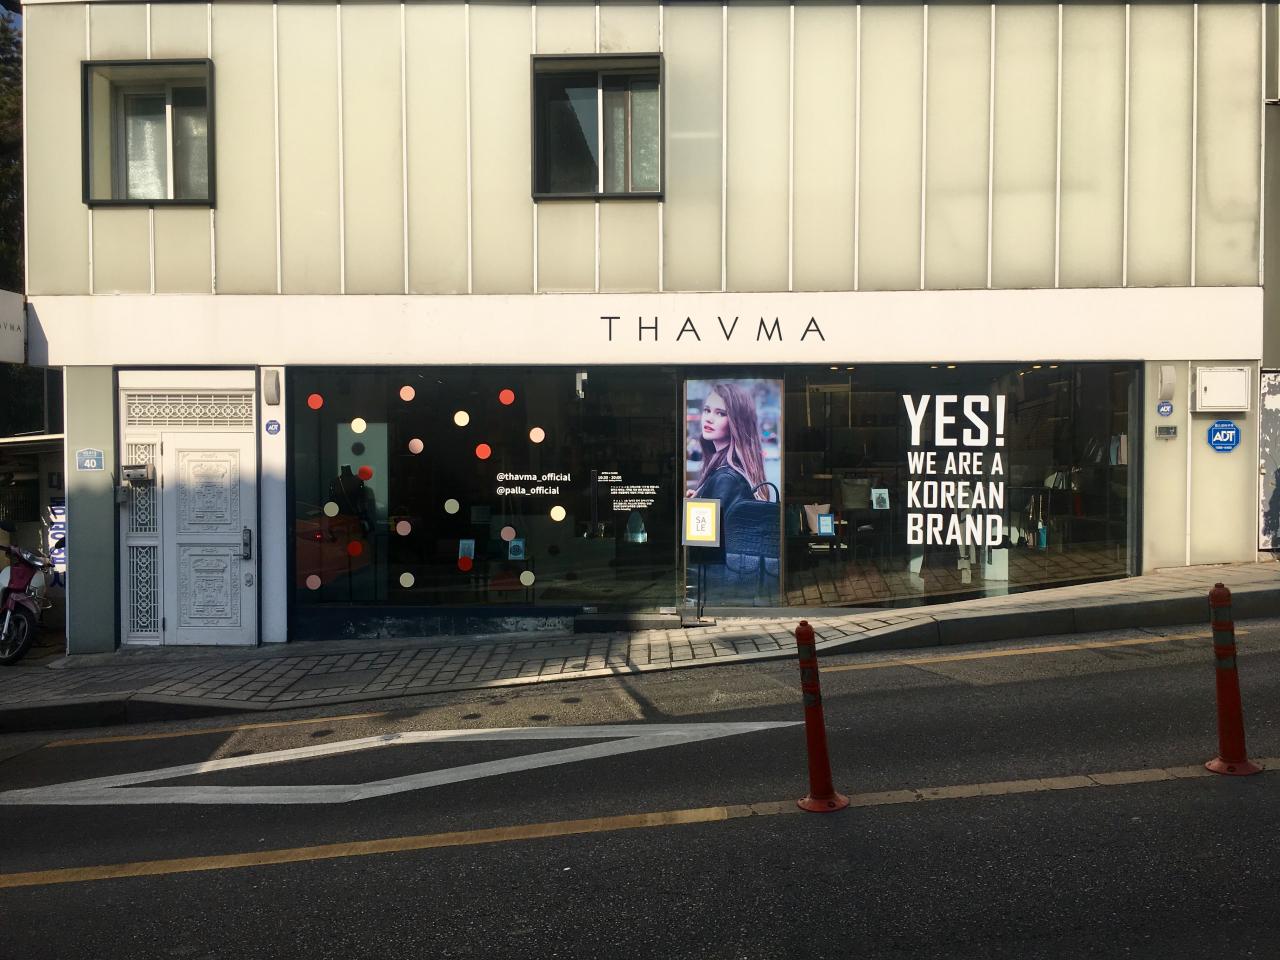 A Thavma flagship store in Samcheong-dong, Seoul (Thavma)